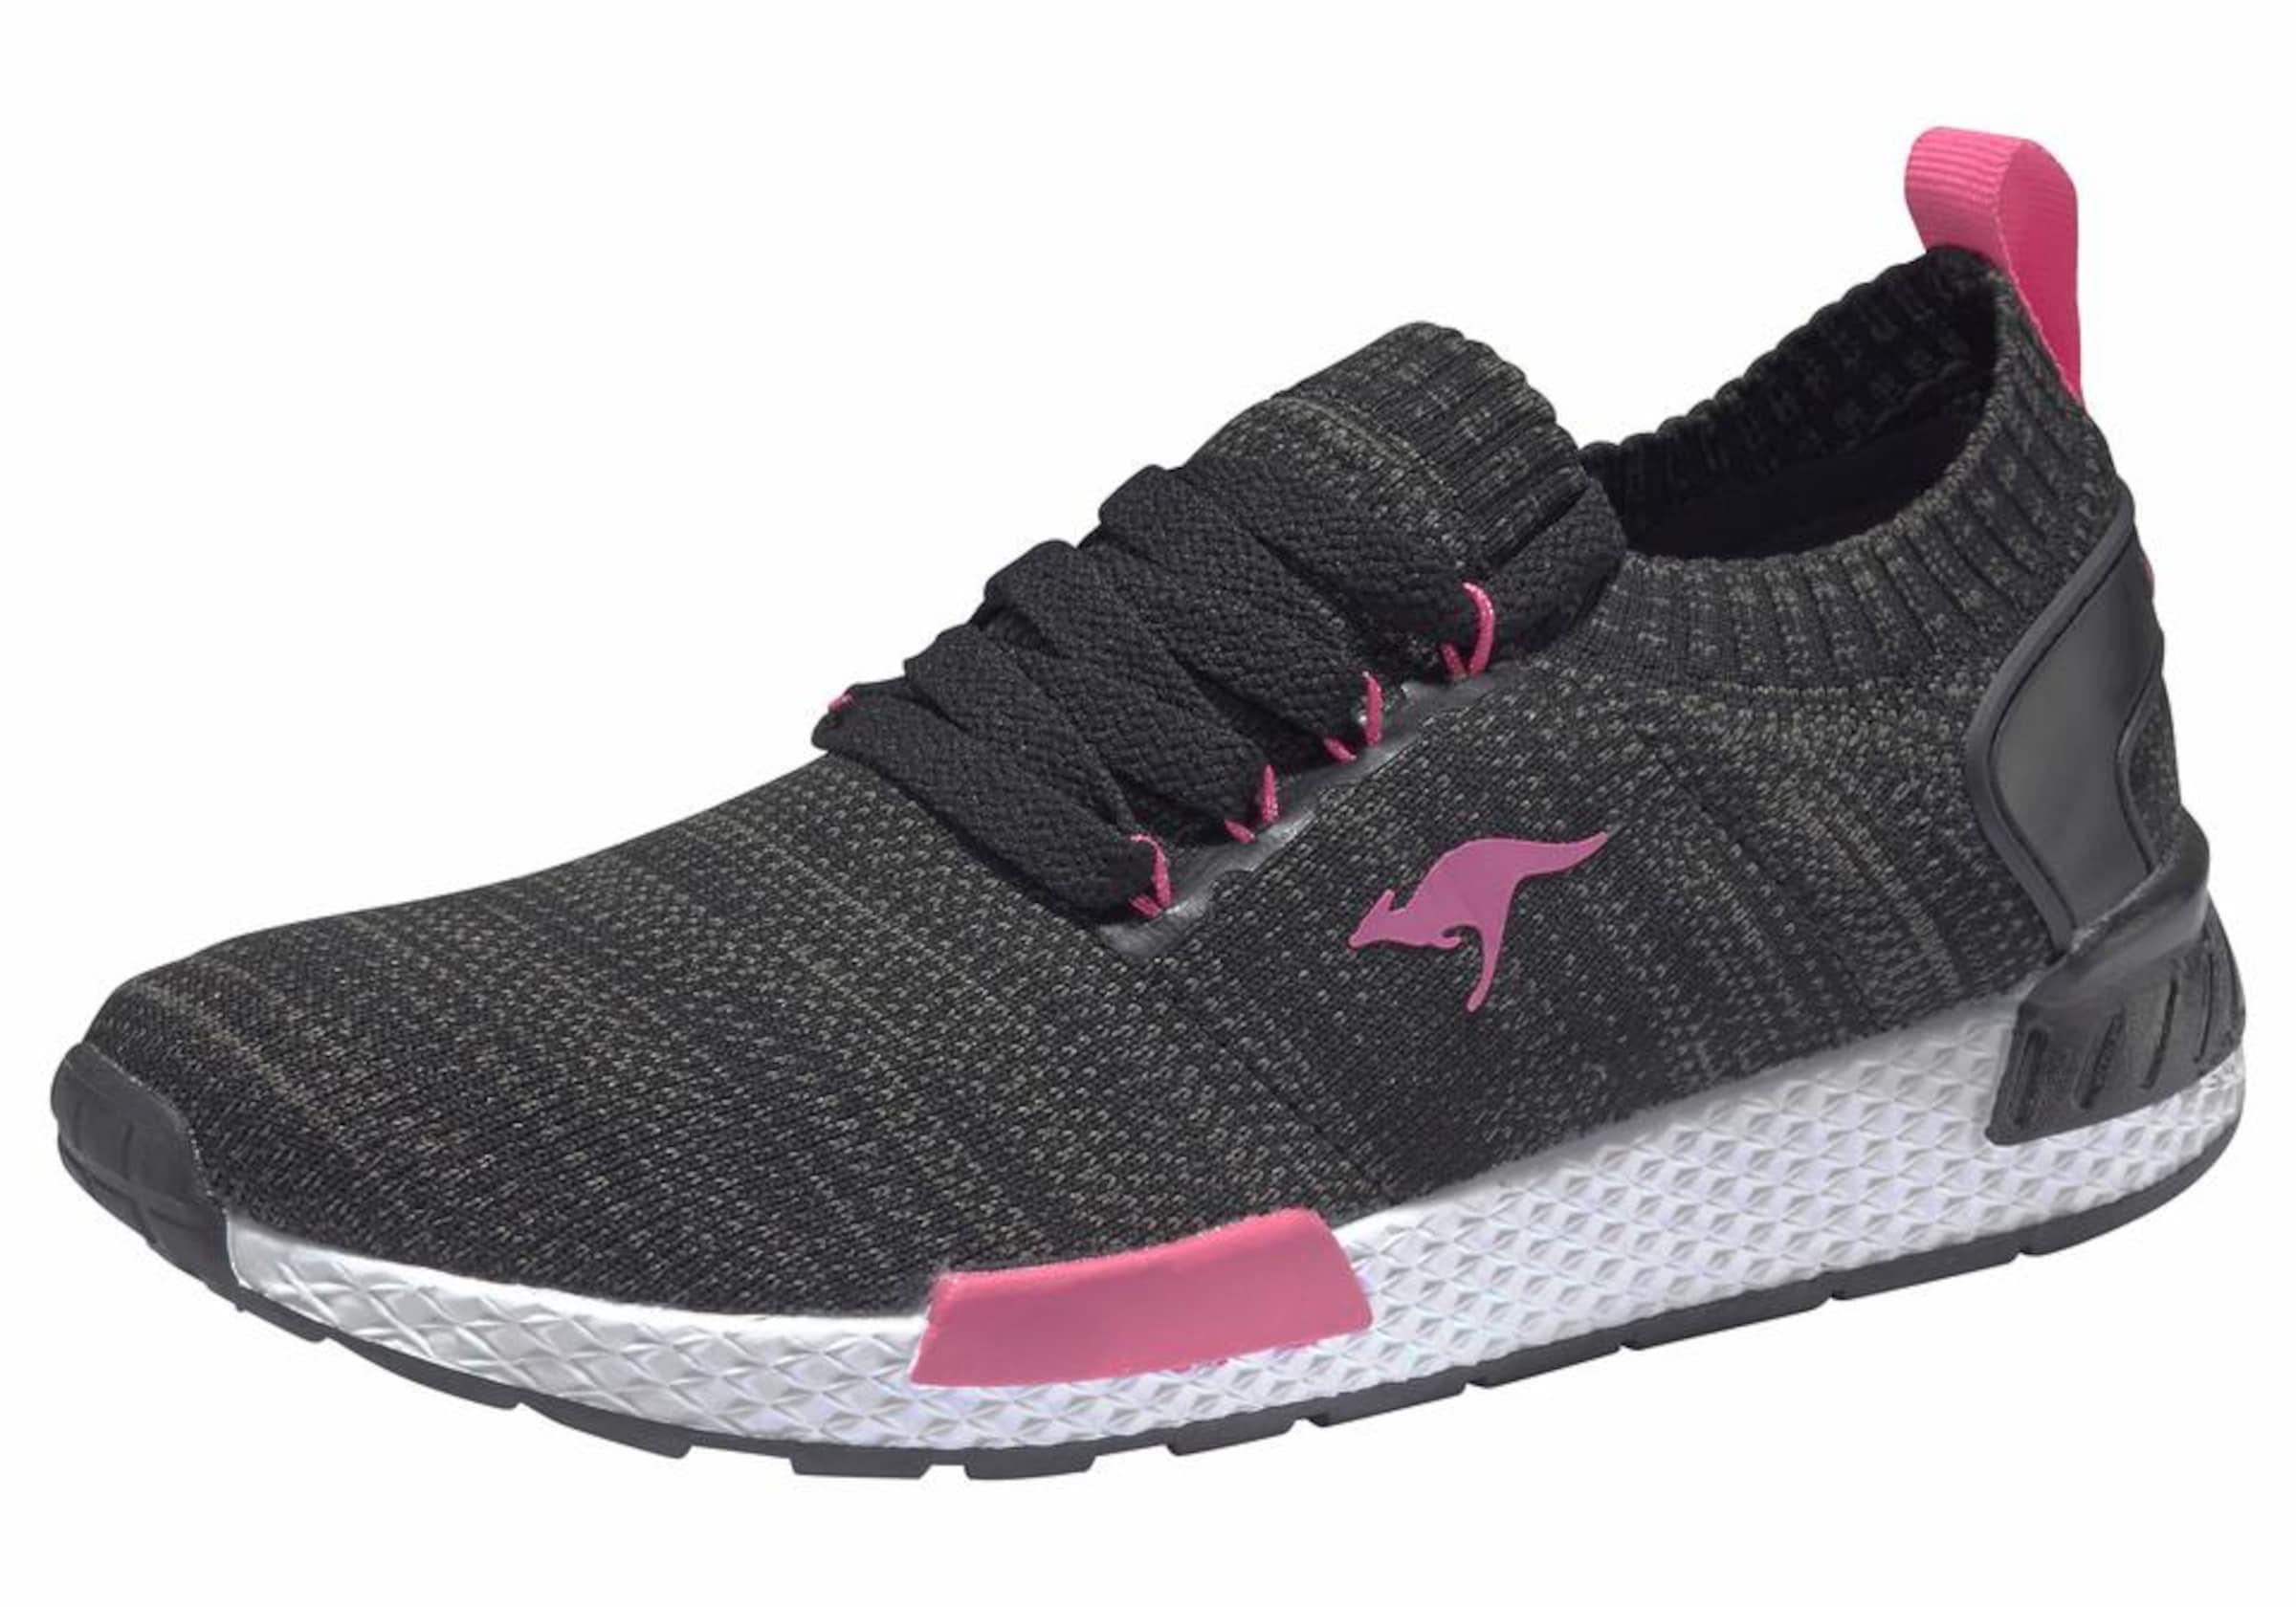 KangaROOS Sneaker W 590 Verschleißfeste billige Schuhe